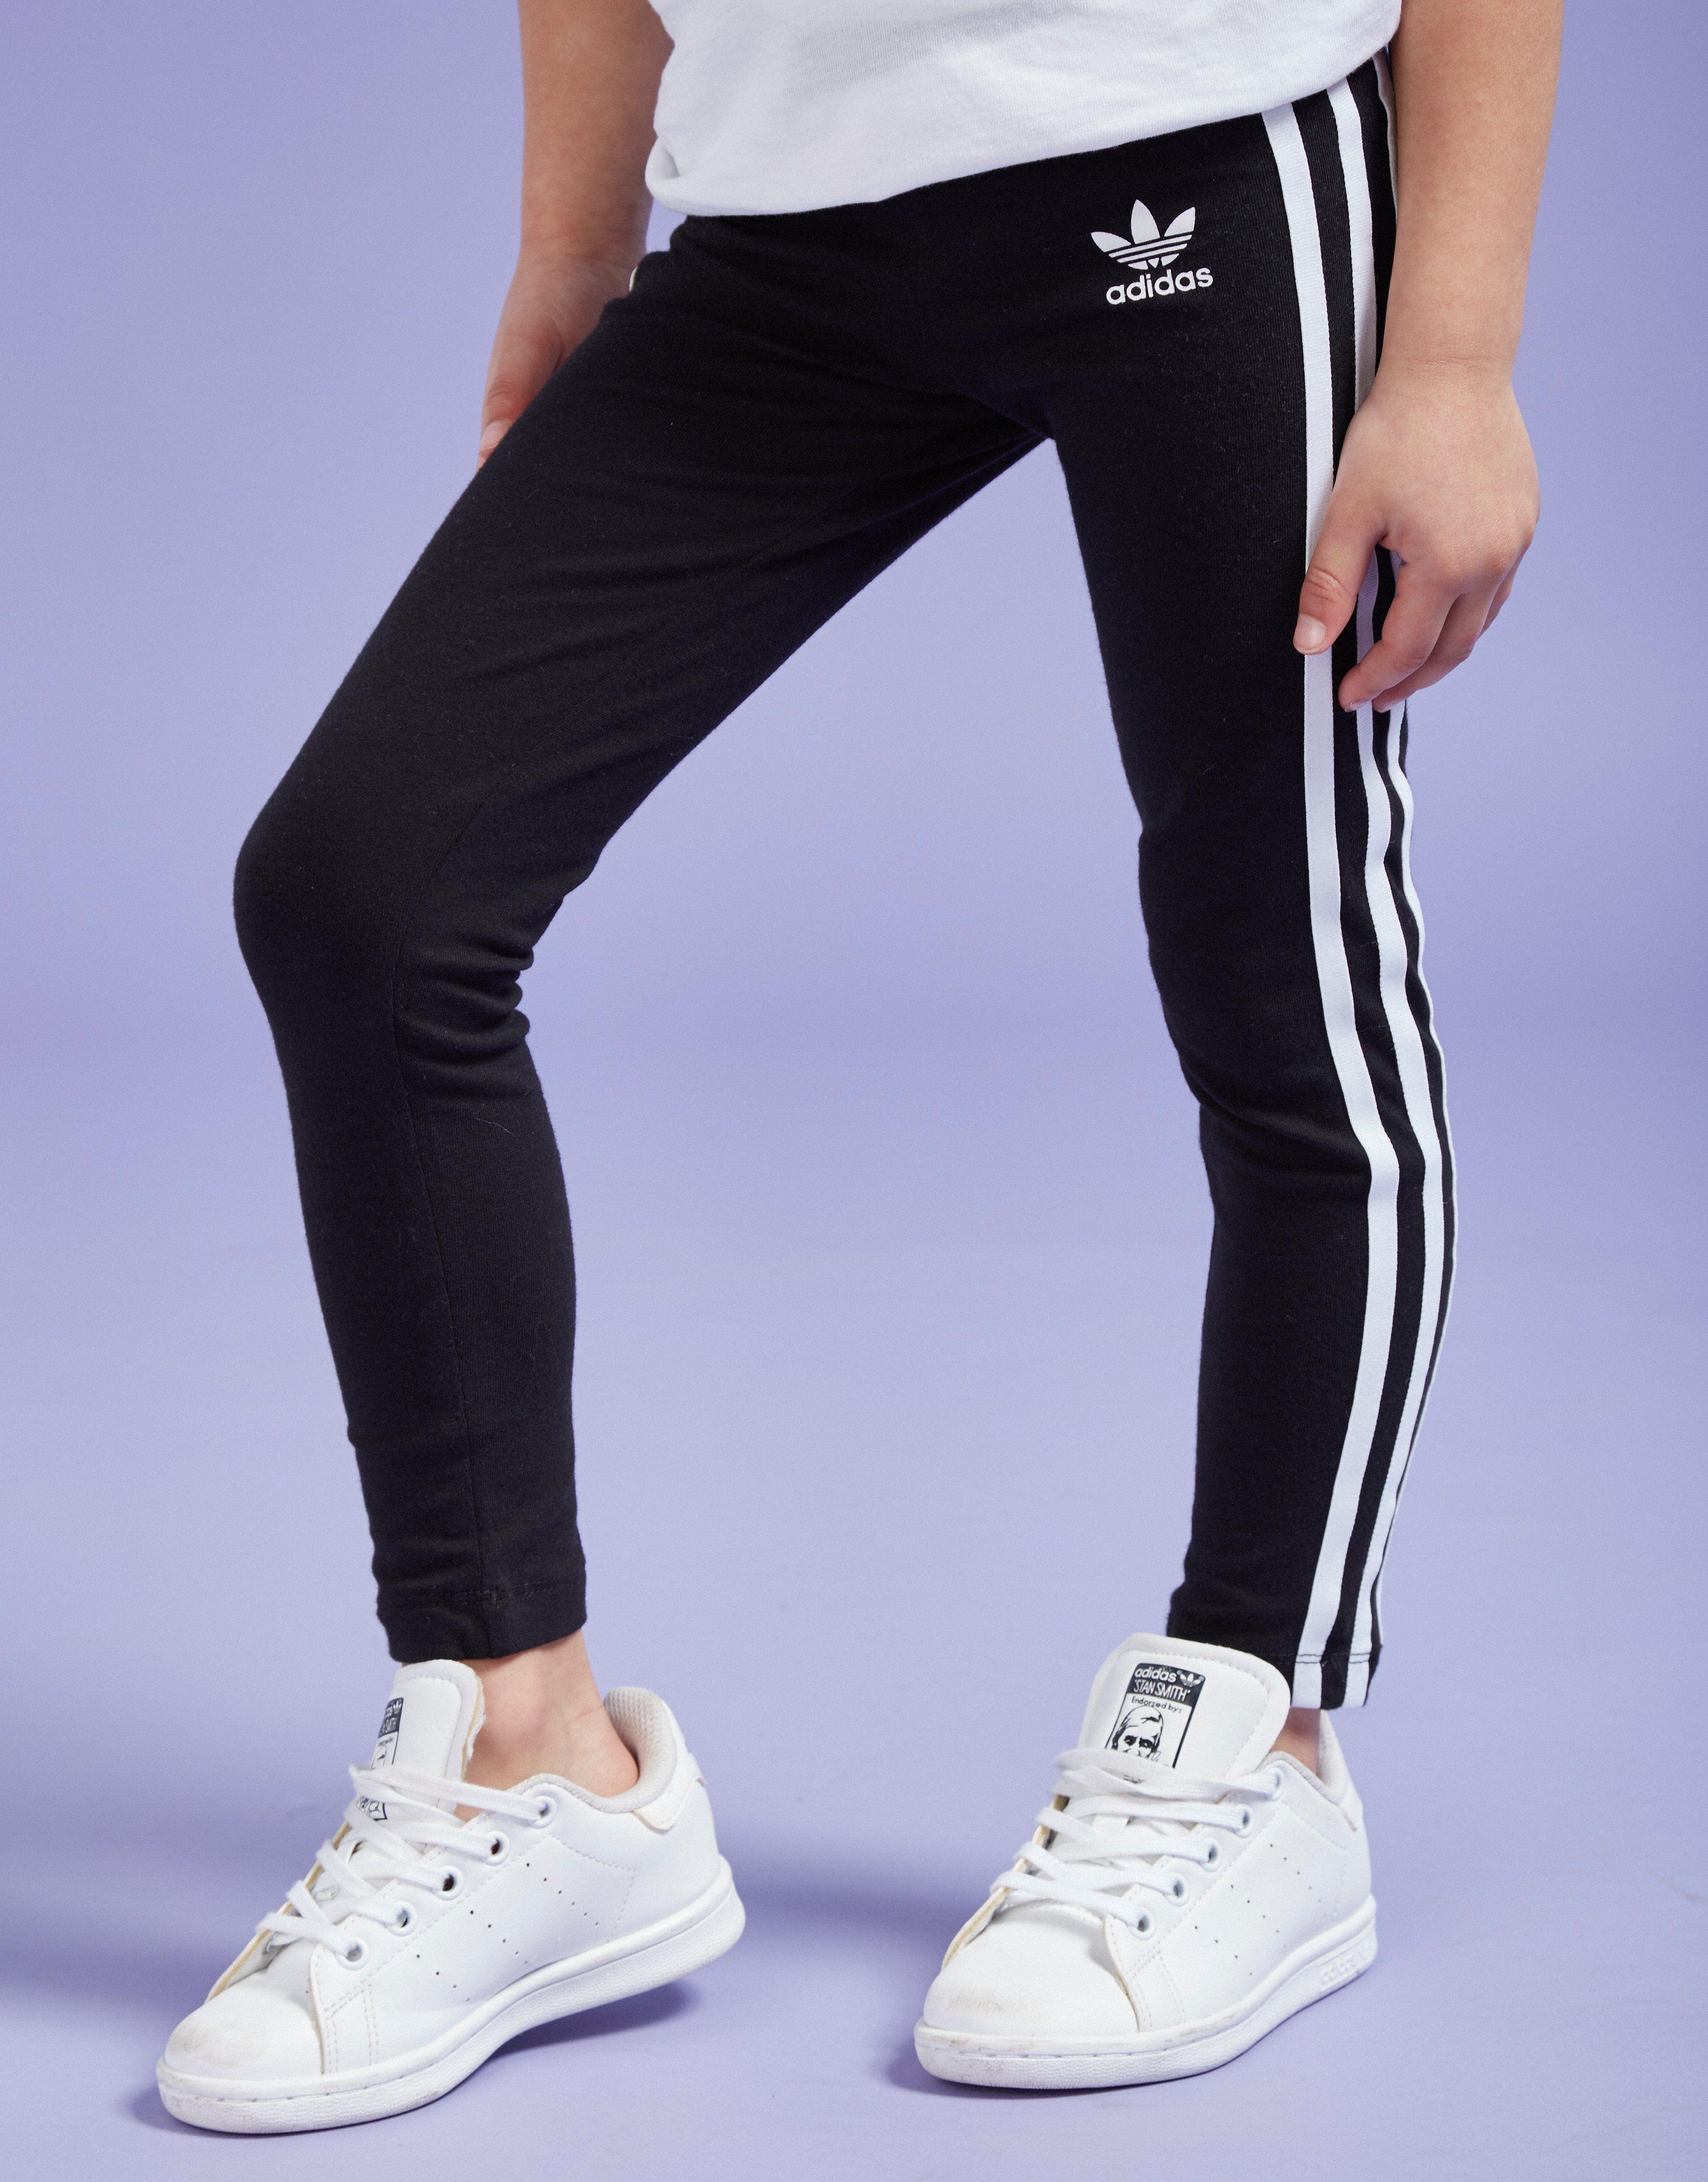 4d067e888 adidas Originals Girls' 3-Stripes Leggings Children | JD Sports Ireland